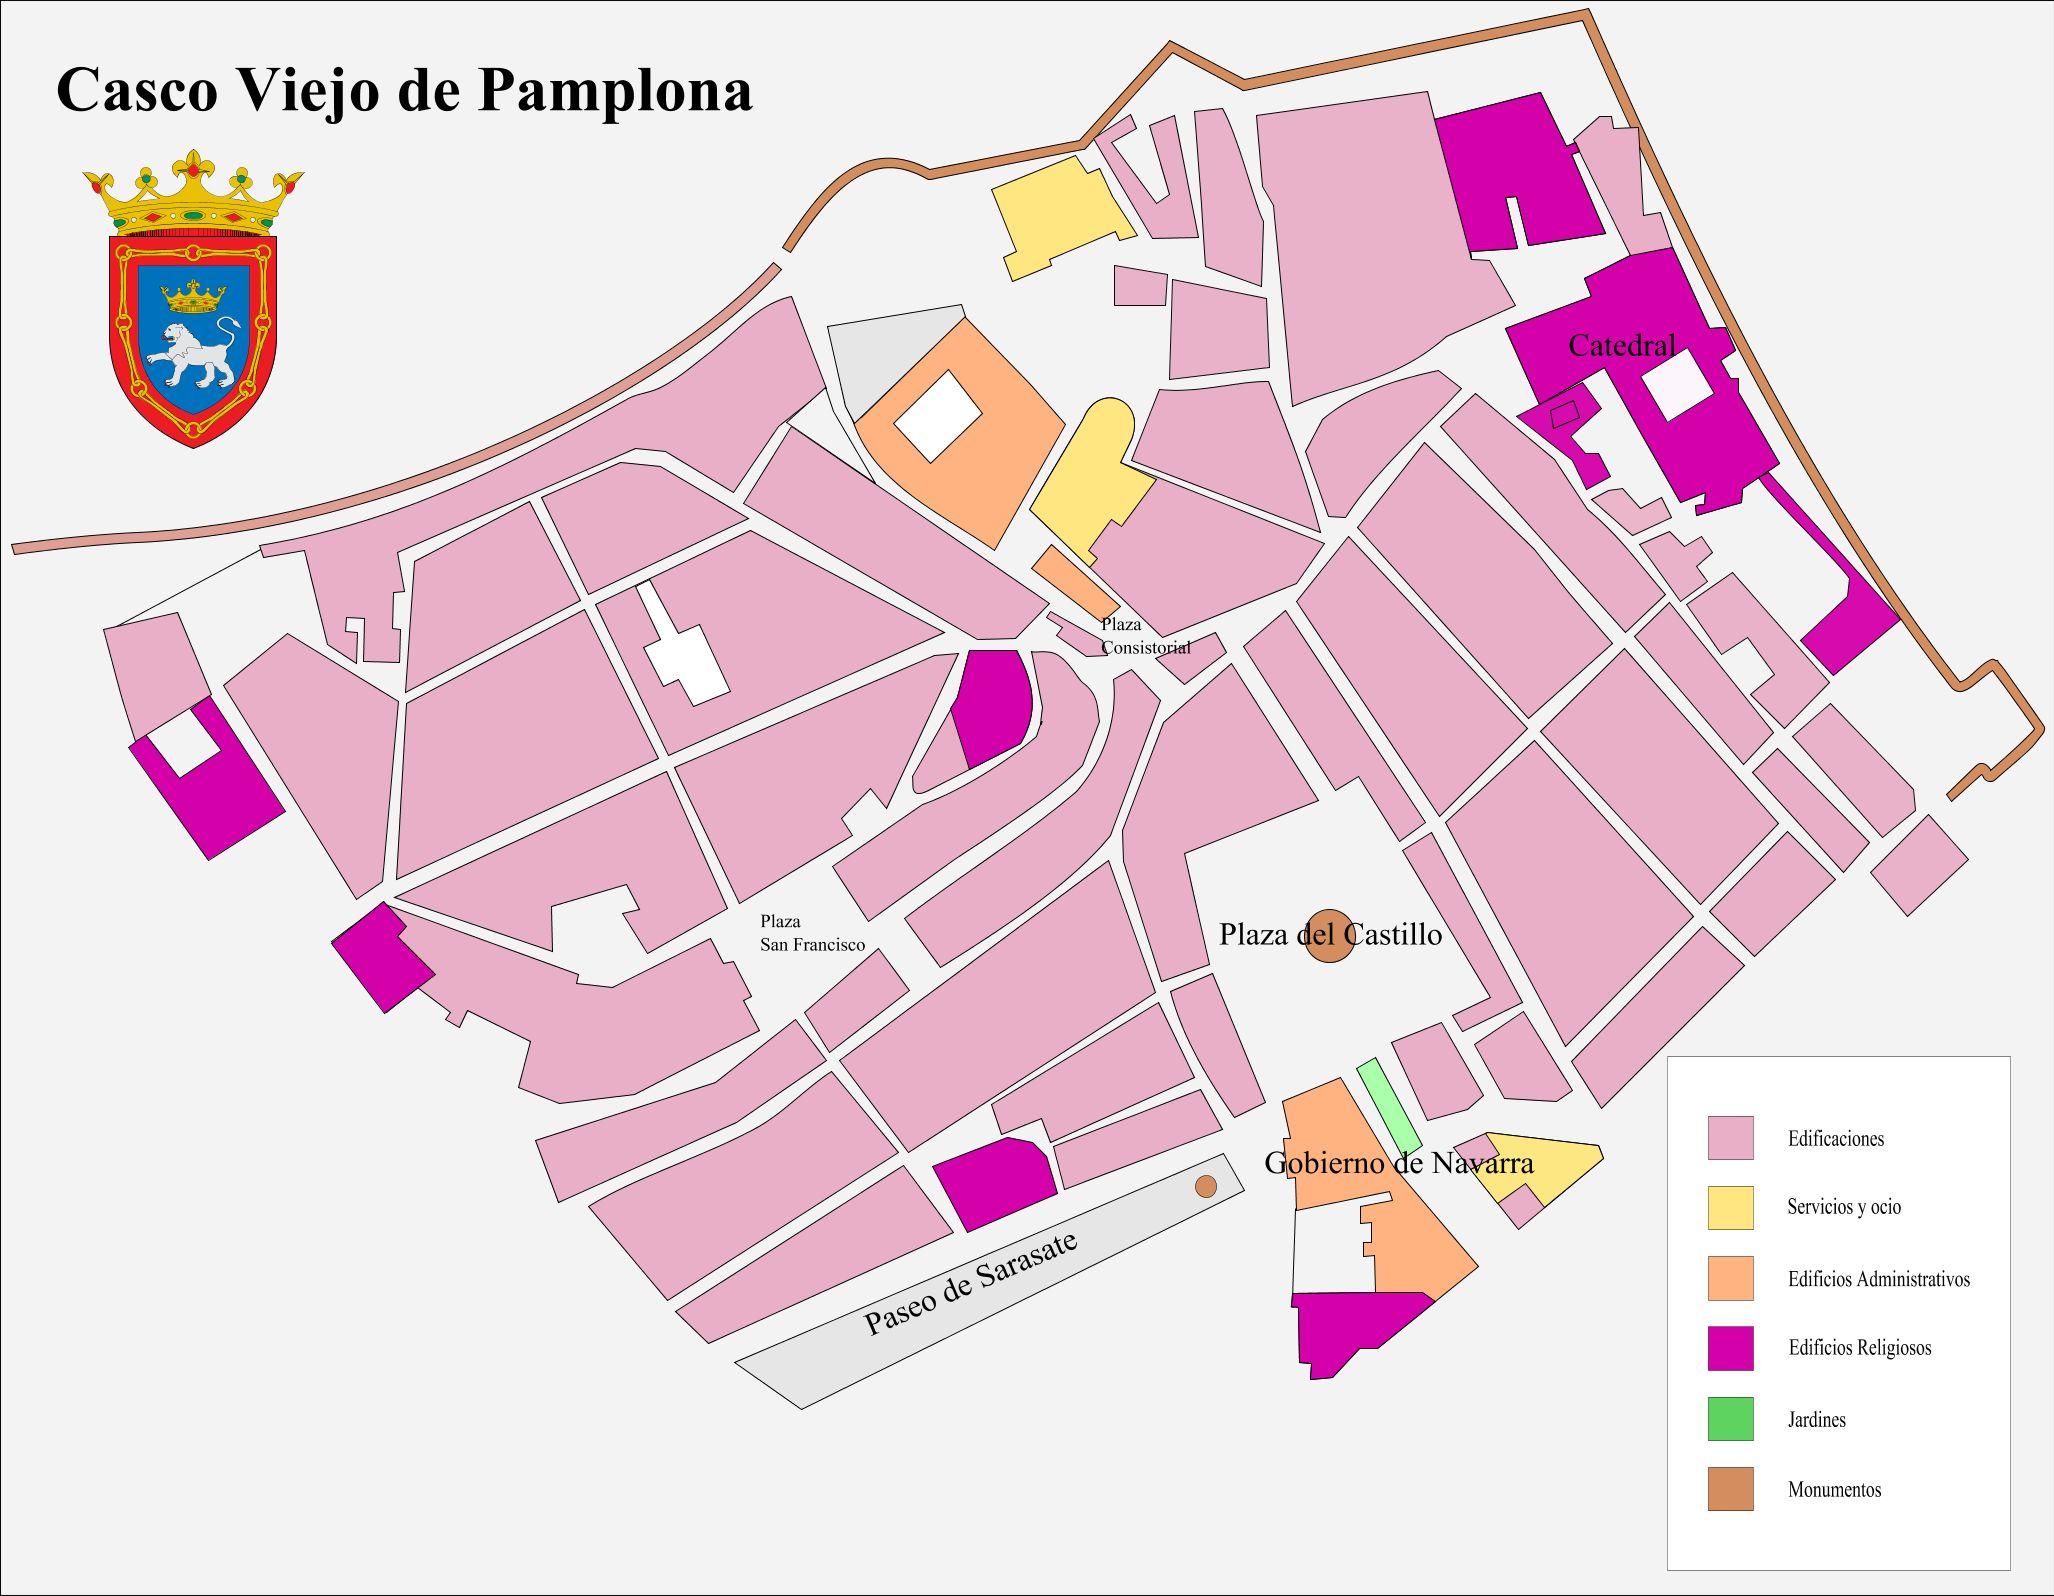 Casco Viejo de Pamplona